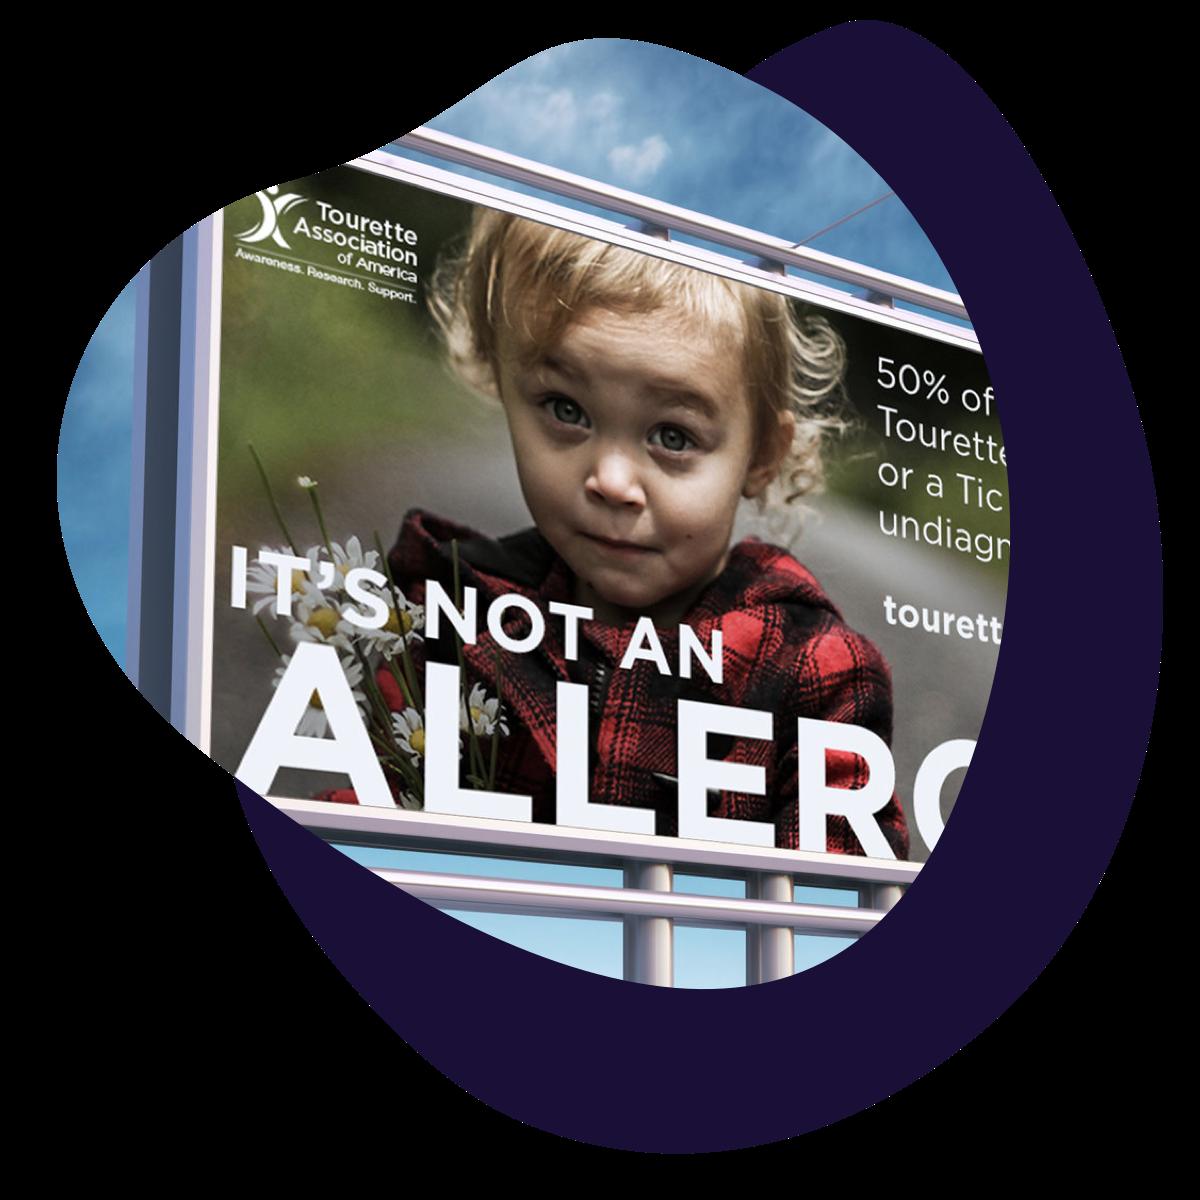 Awareness & Fundraising Campaign - Tourette Association of AmericaDesignMediaSocial Media